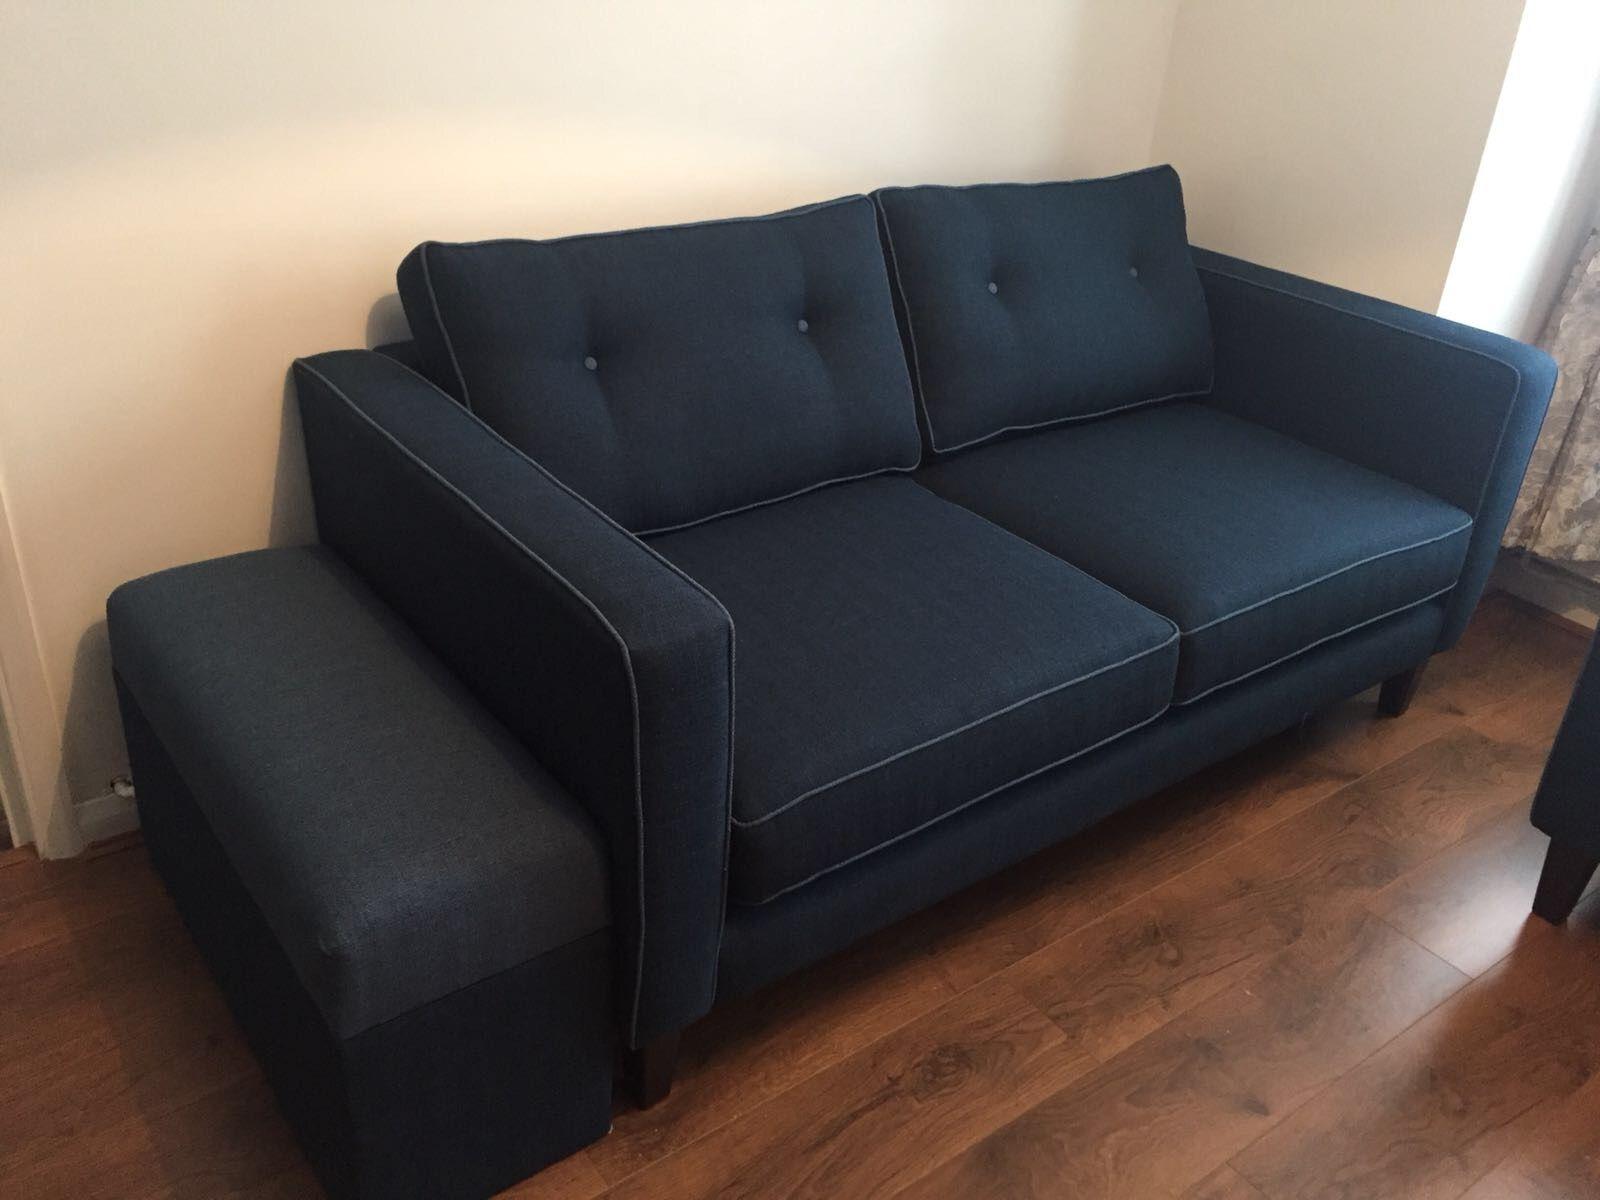 Bon Retro Sofa Made To Measure   175 Cm X 91 Cm. 2 Base Cushions In